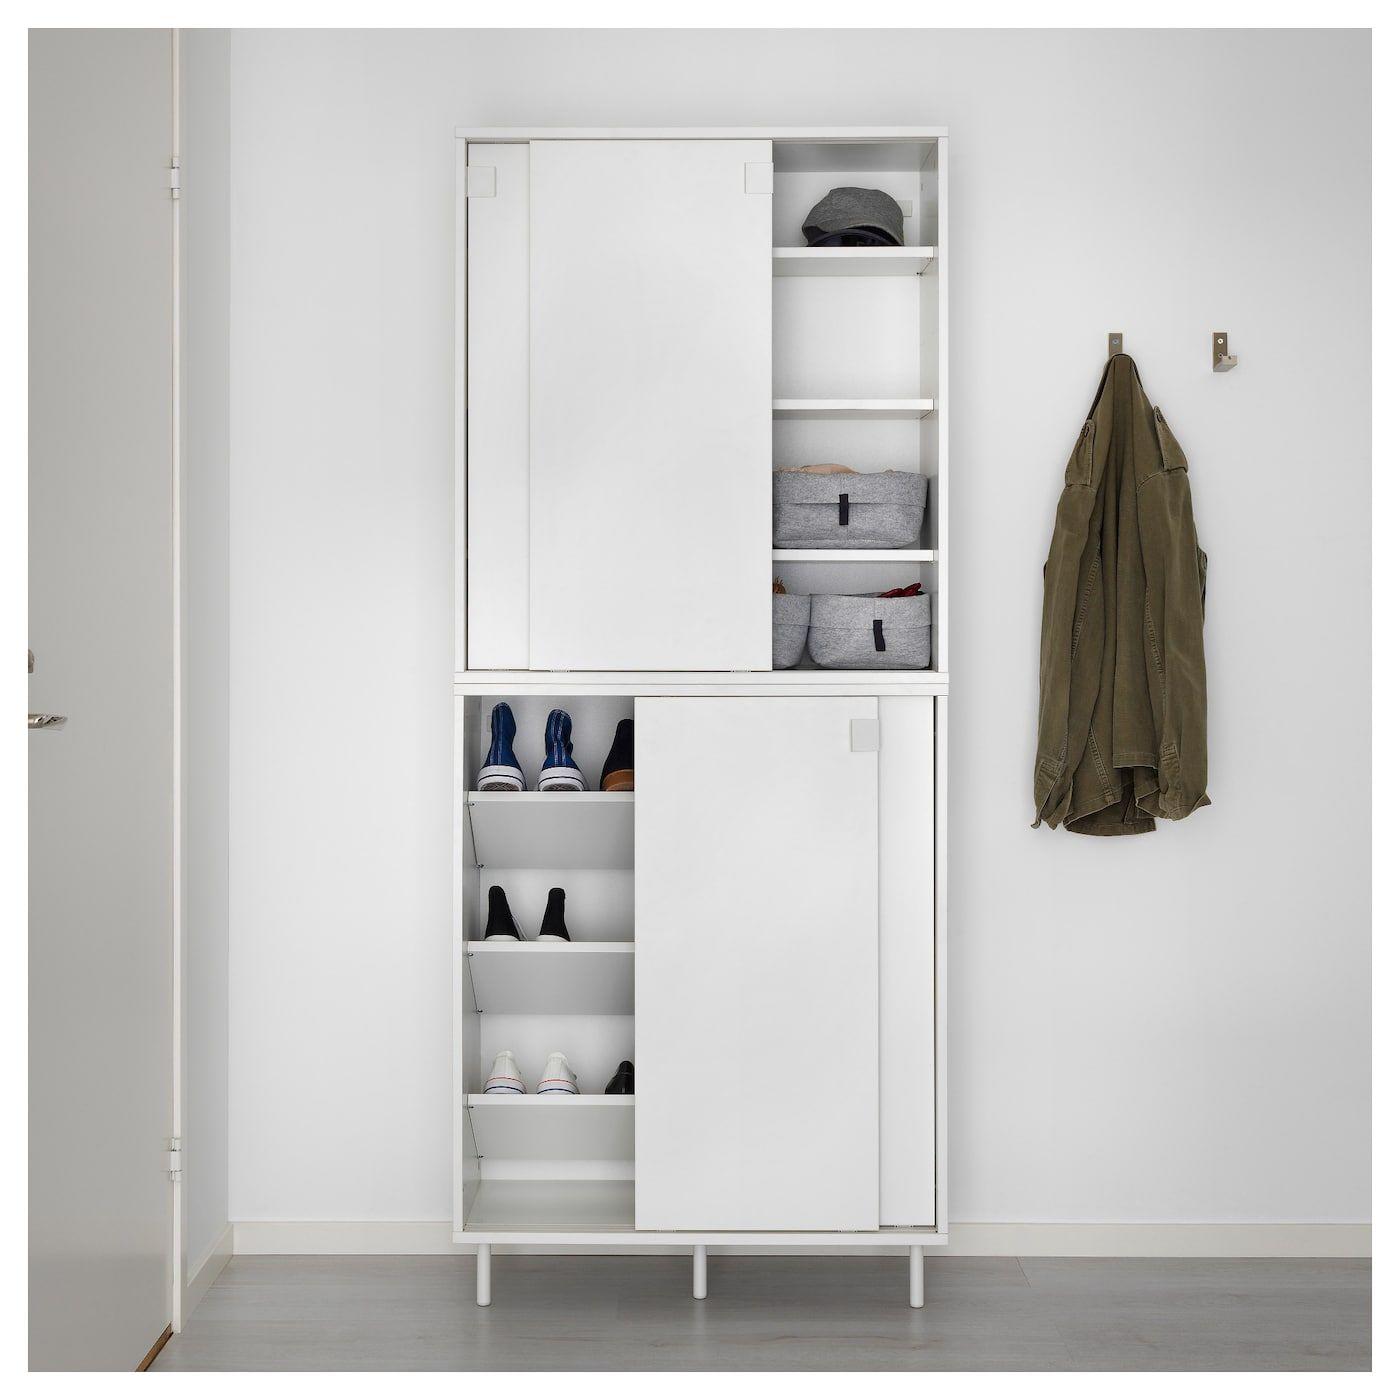 Mackapar Shoe Storage Cabinet White 31 1 2x40 1 8 Shoe